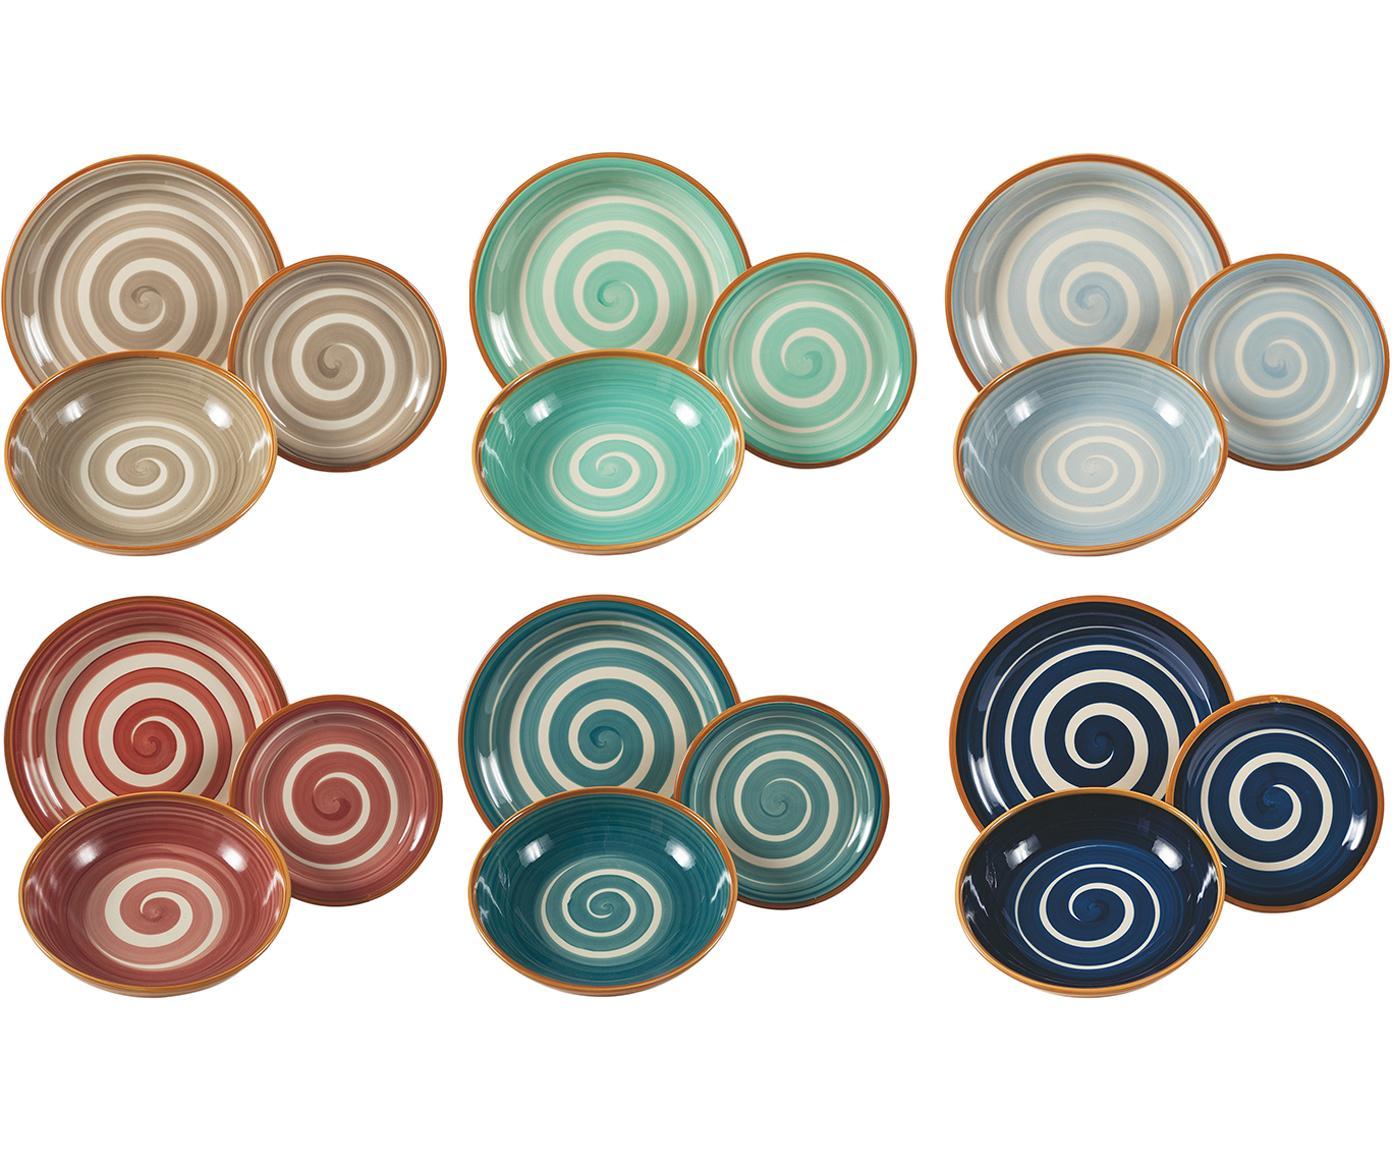 Serviesset Formentera, 6 personen (18-delig), Keramiek, Multicolour, Verschillende formaten